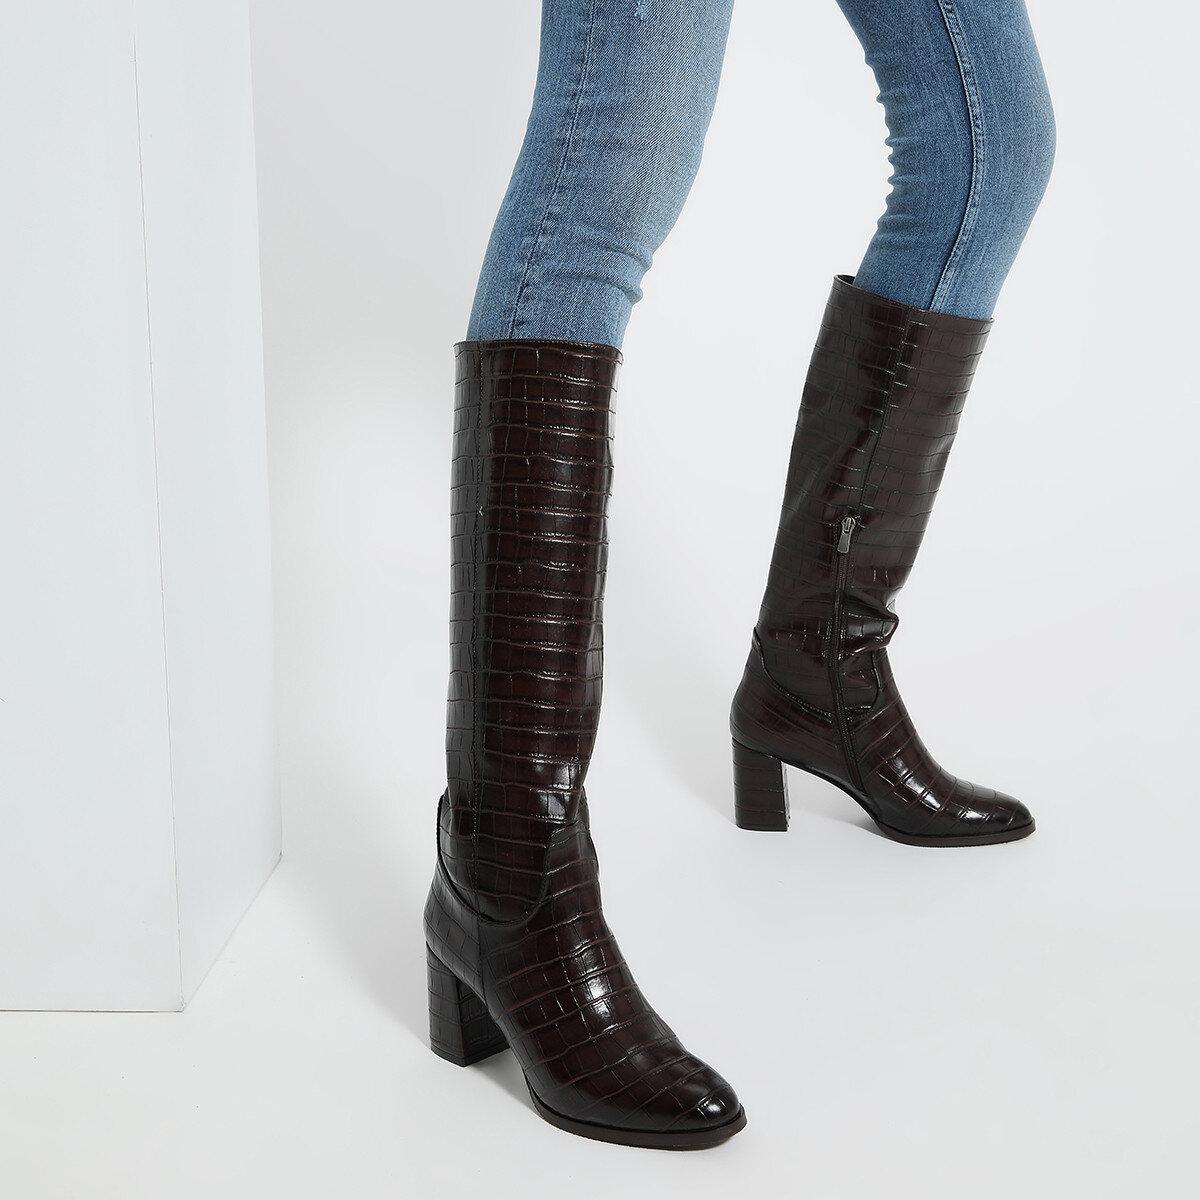 MASSA Kahverengi Kadın Topuklu Çizme